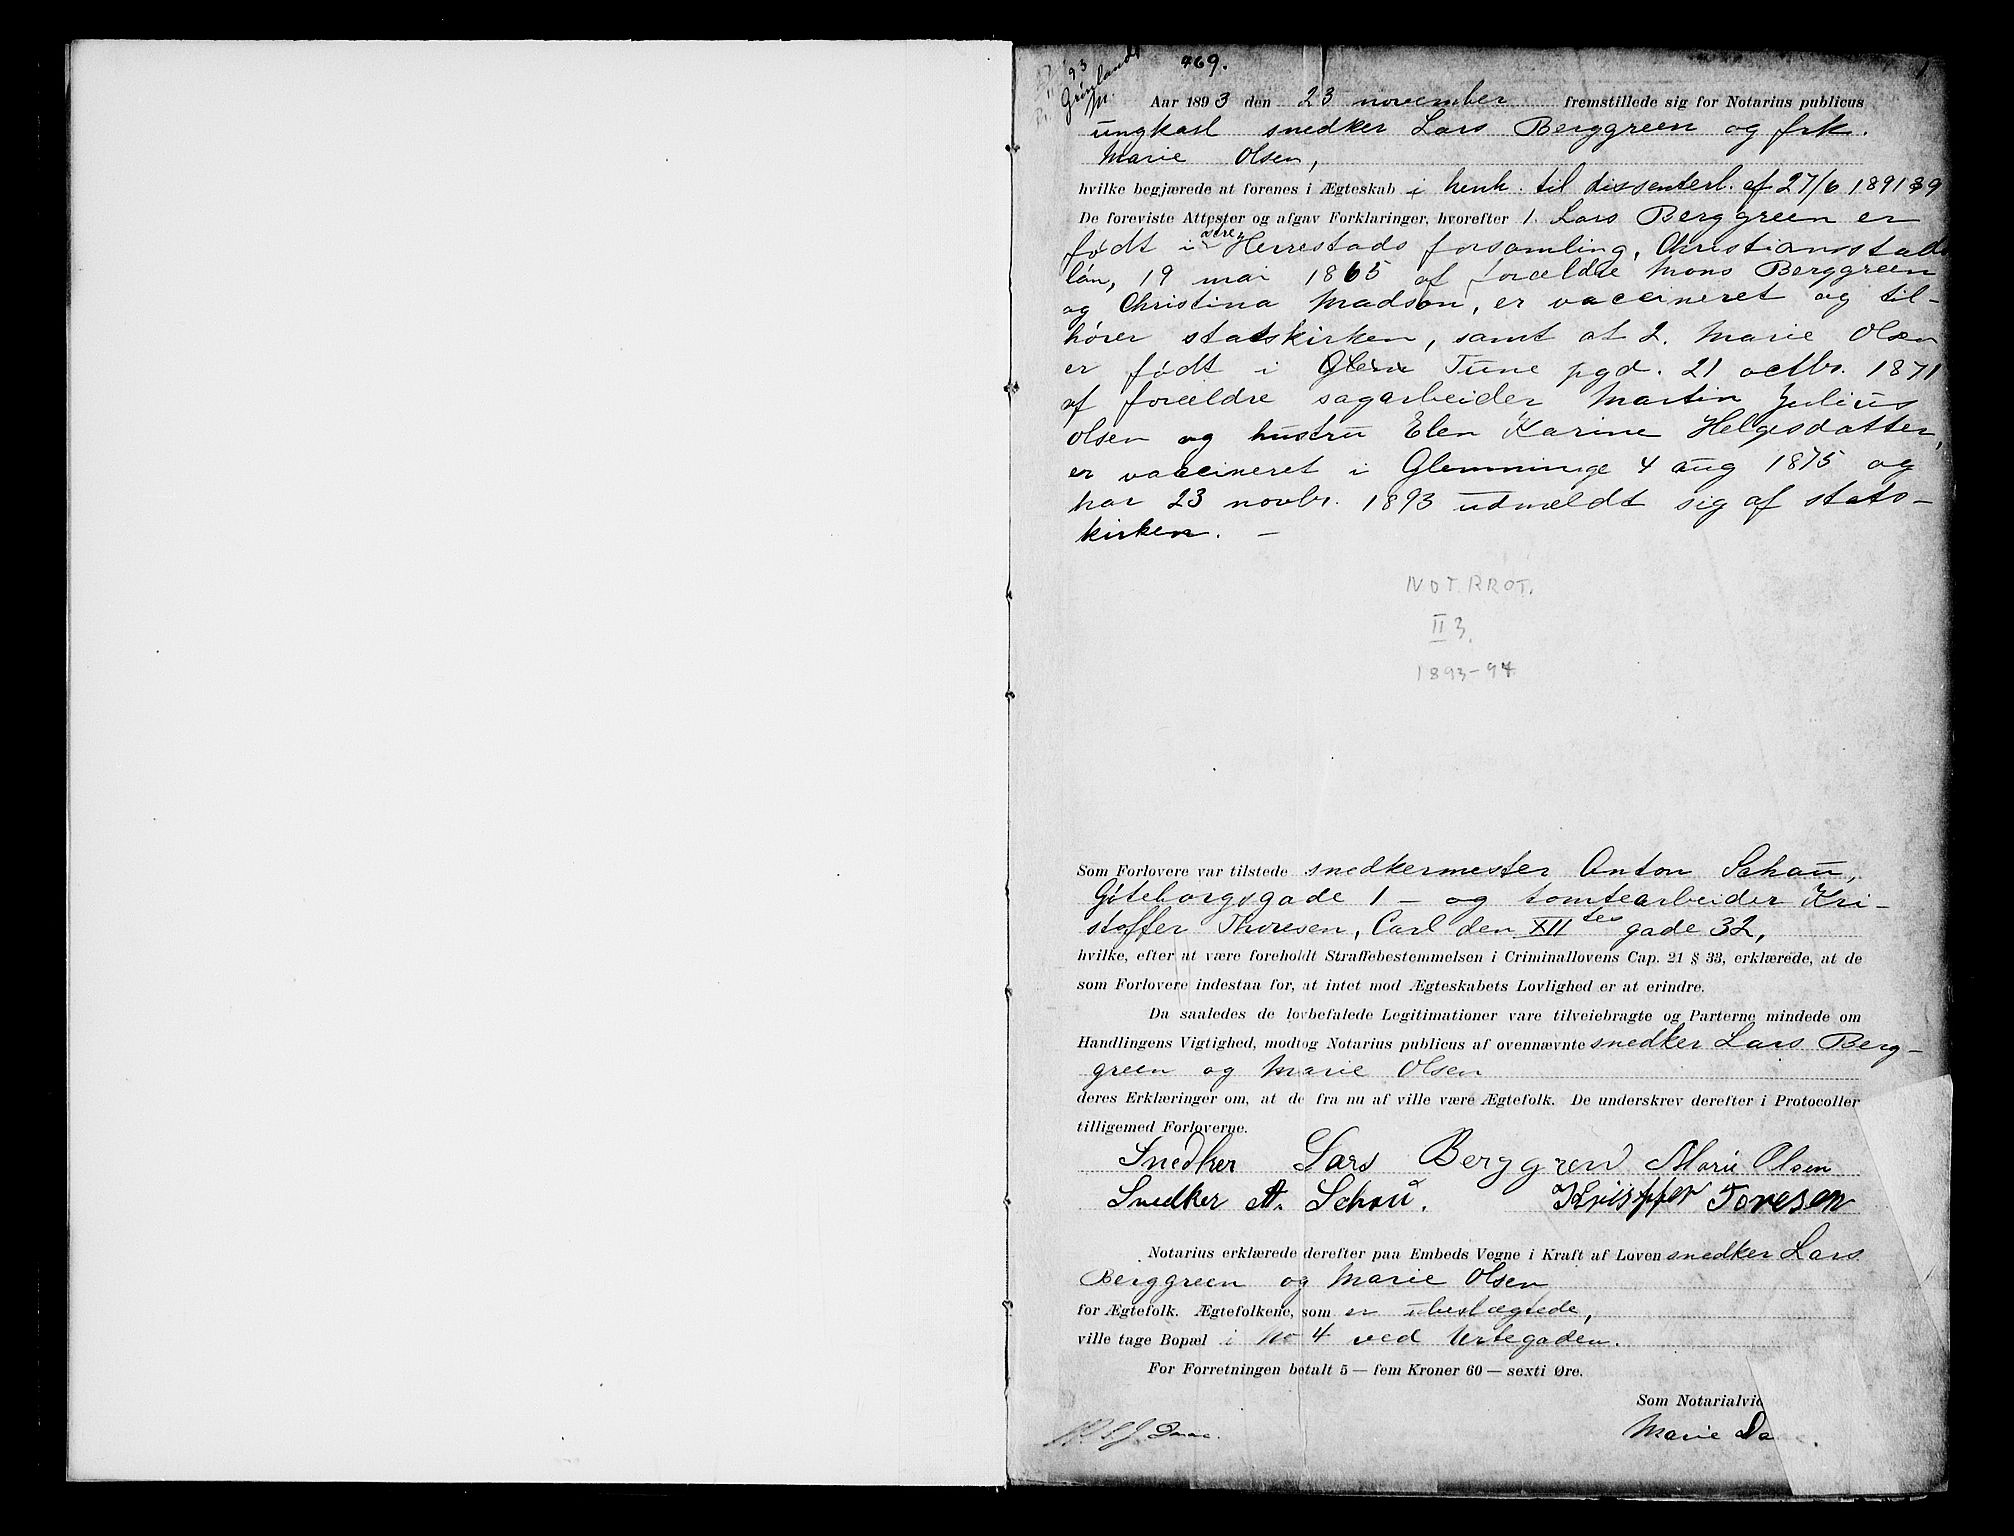 SAO, Oslo byfogd avd. I, L/Lb/Lbb/L0003: Notarialprotokoll, rekke II: Vigsler, 1893-1897, s. 1a